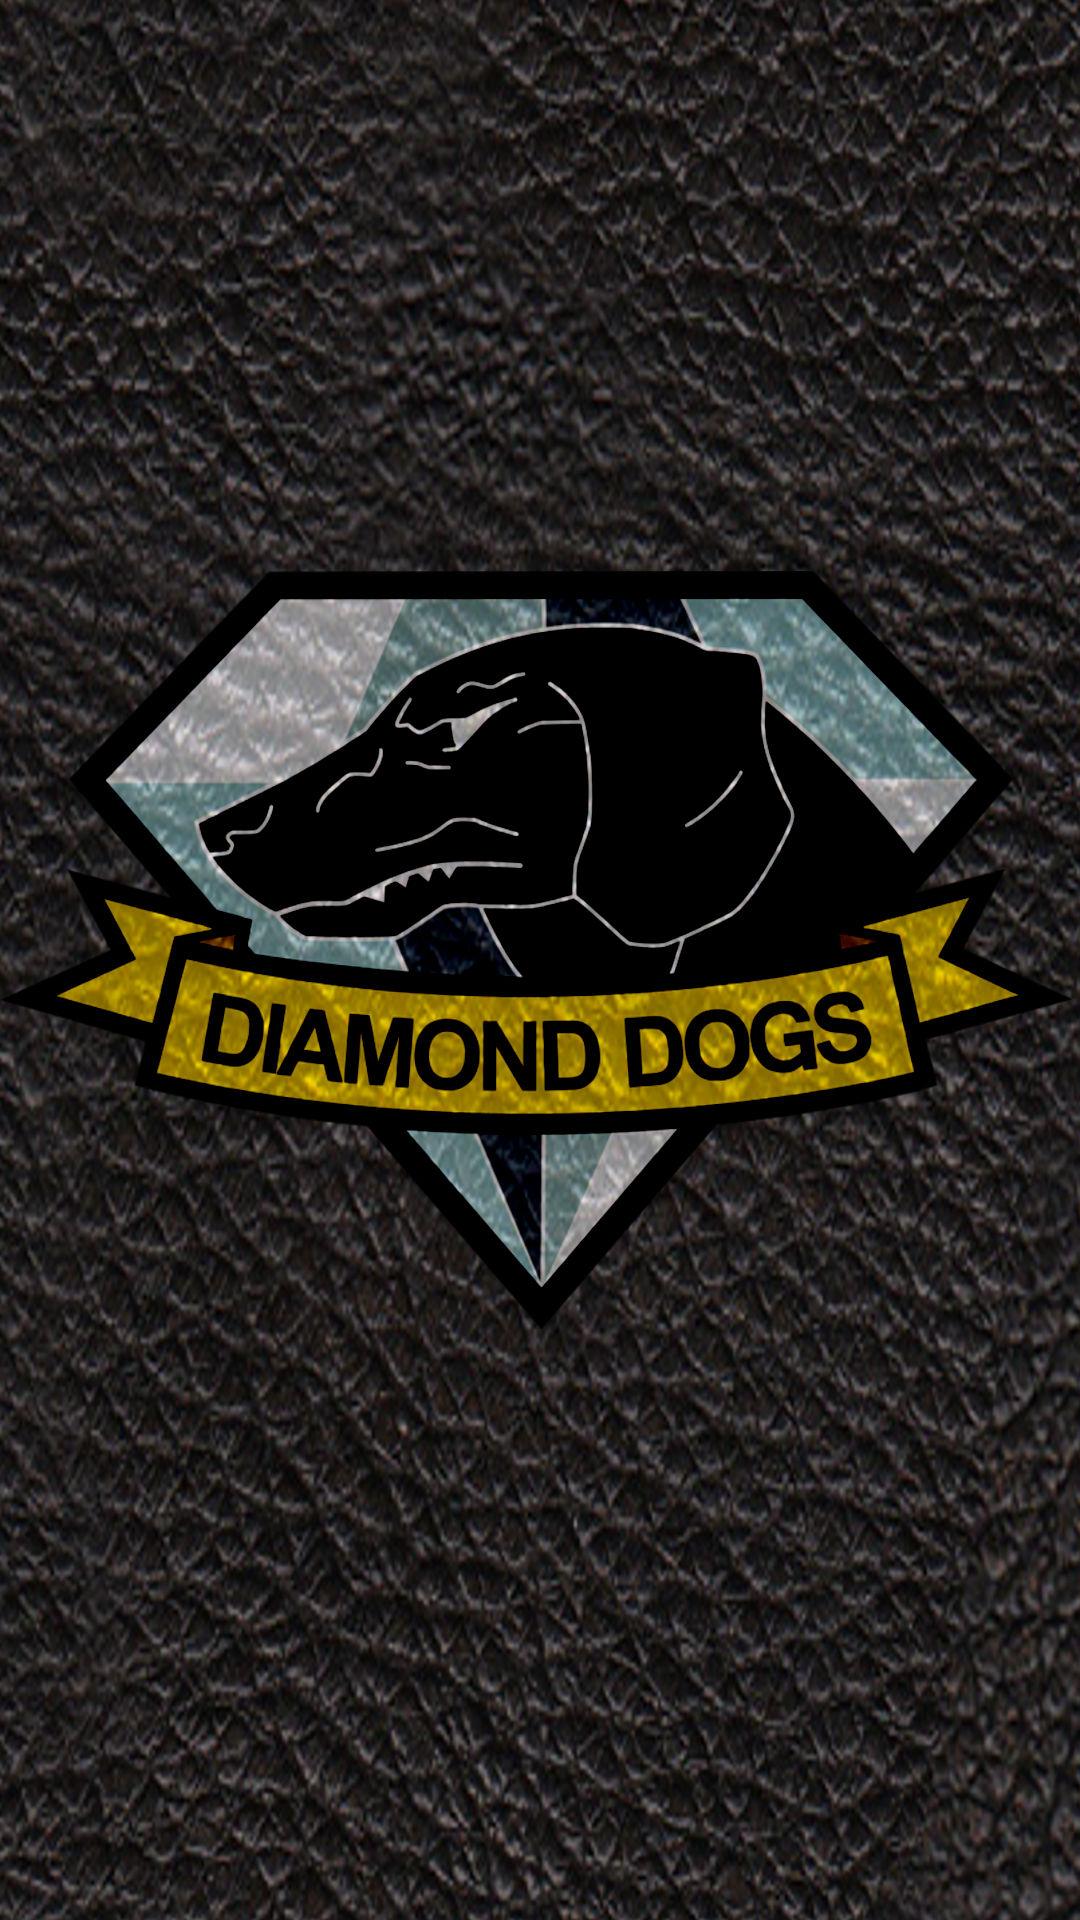 Metal Gear Solid 5 Diamond Dogs 1080x1920